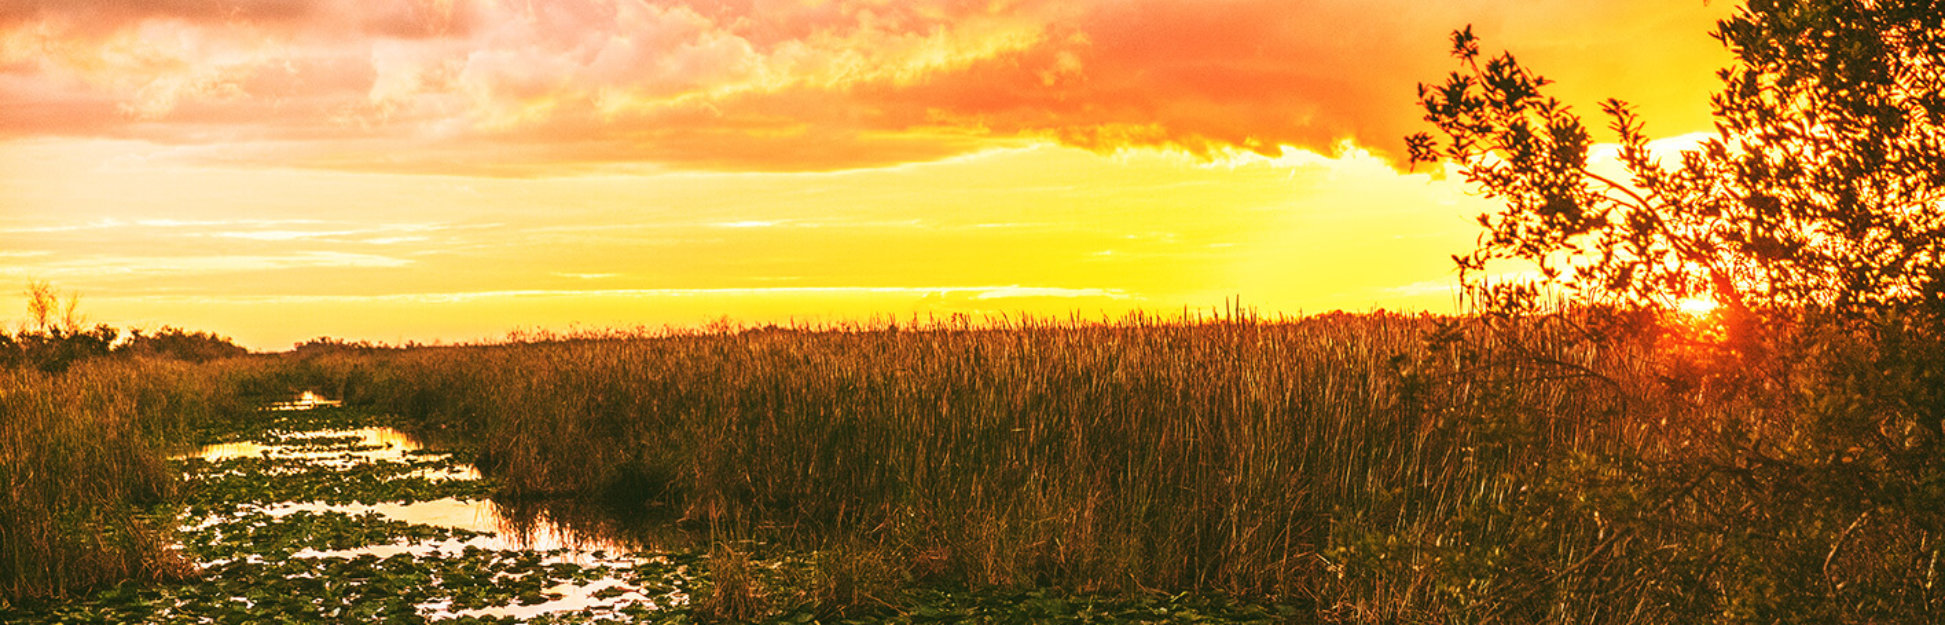 Everglades golden hour